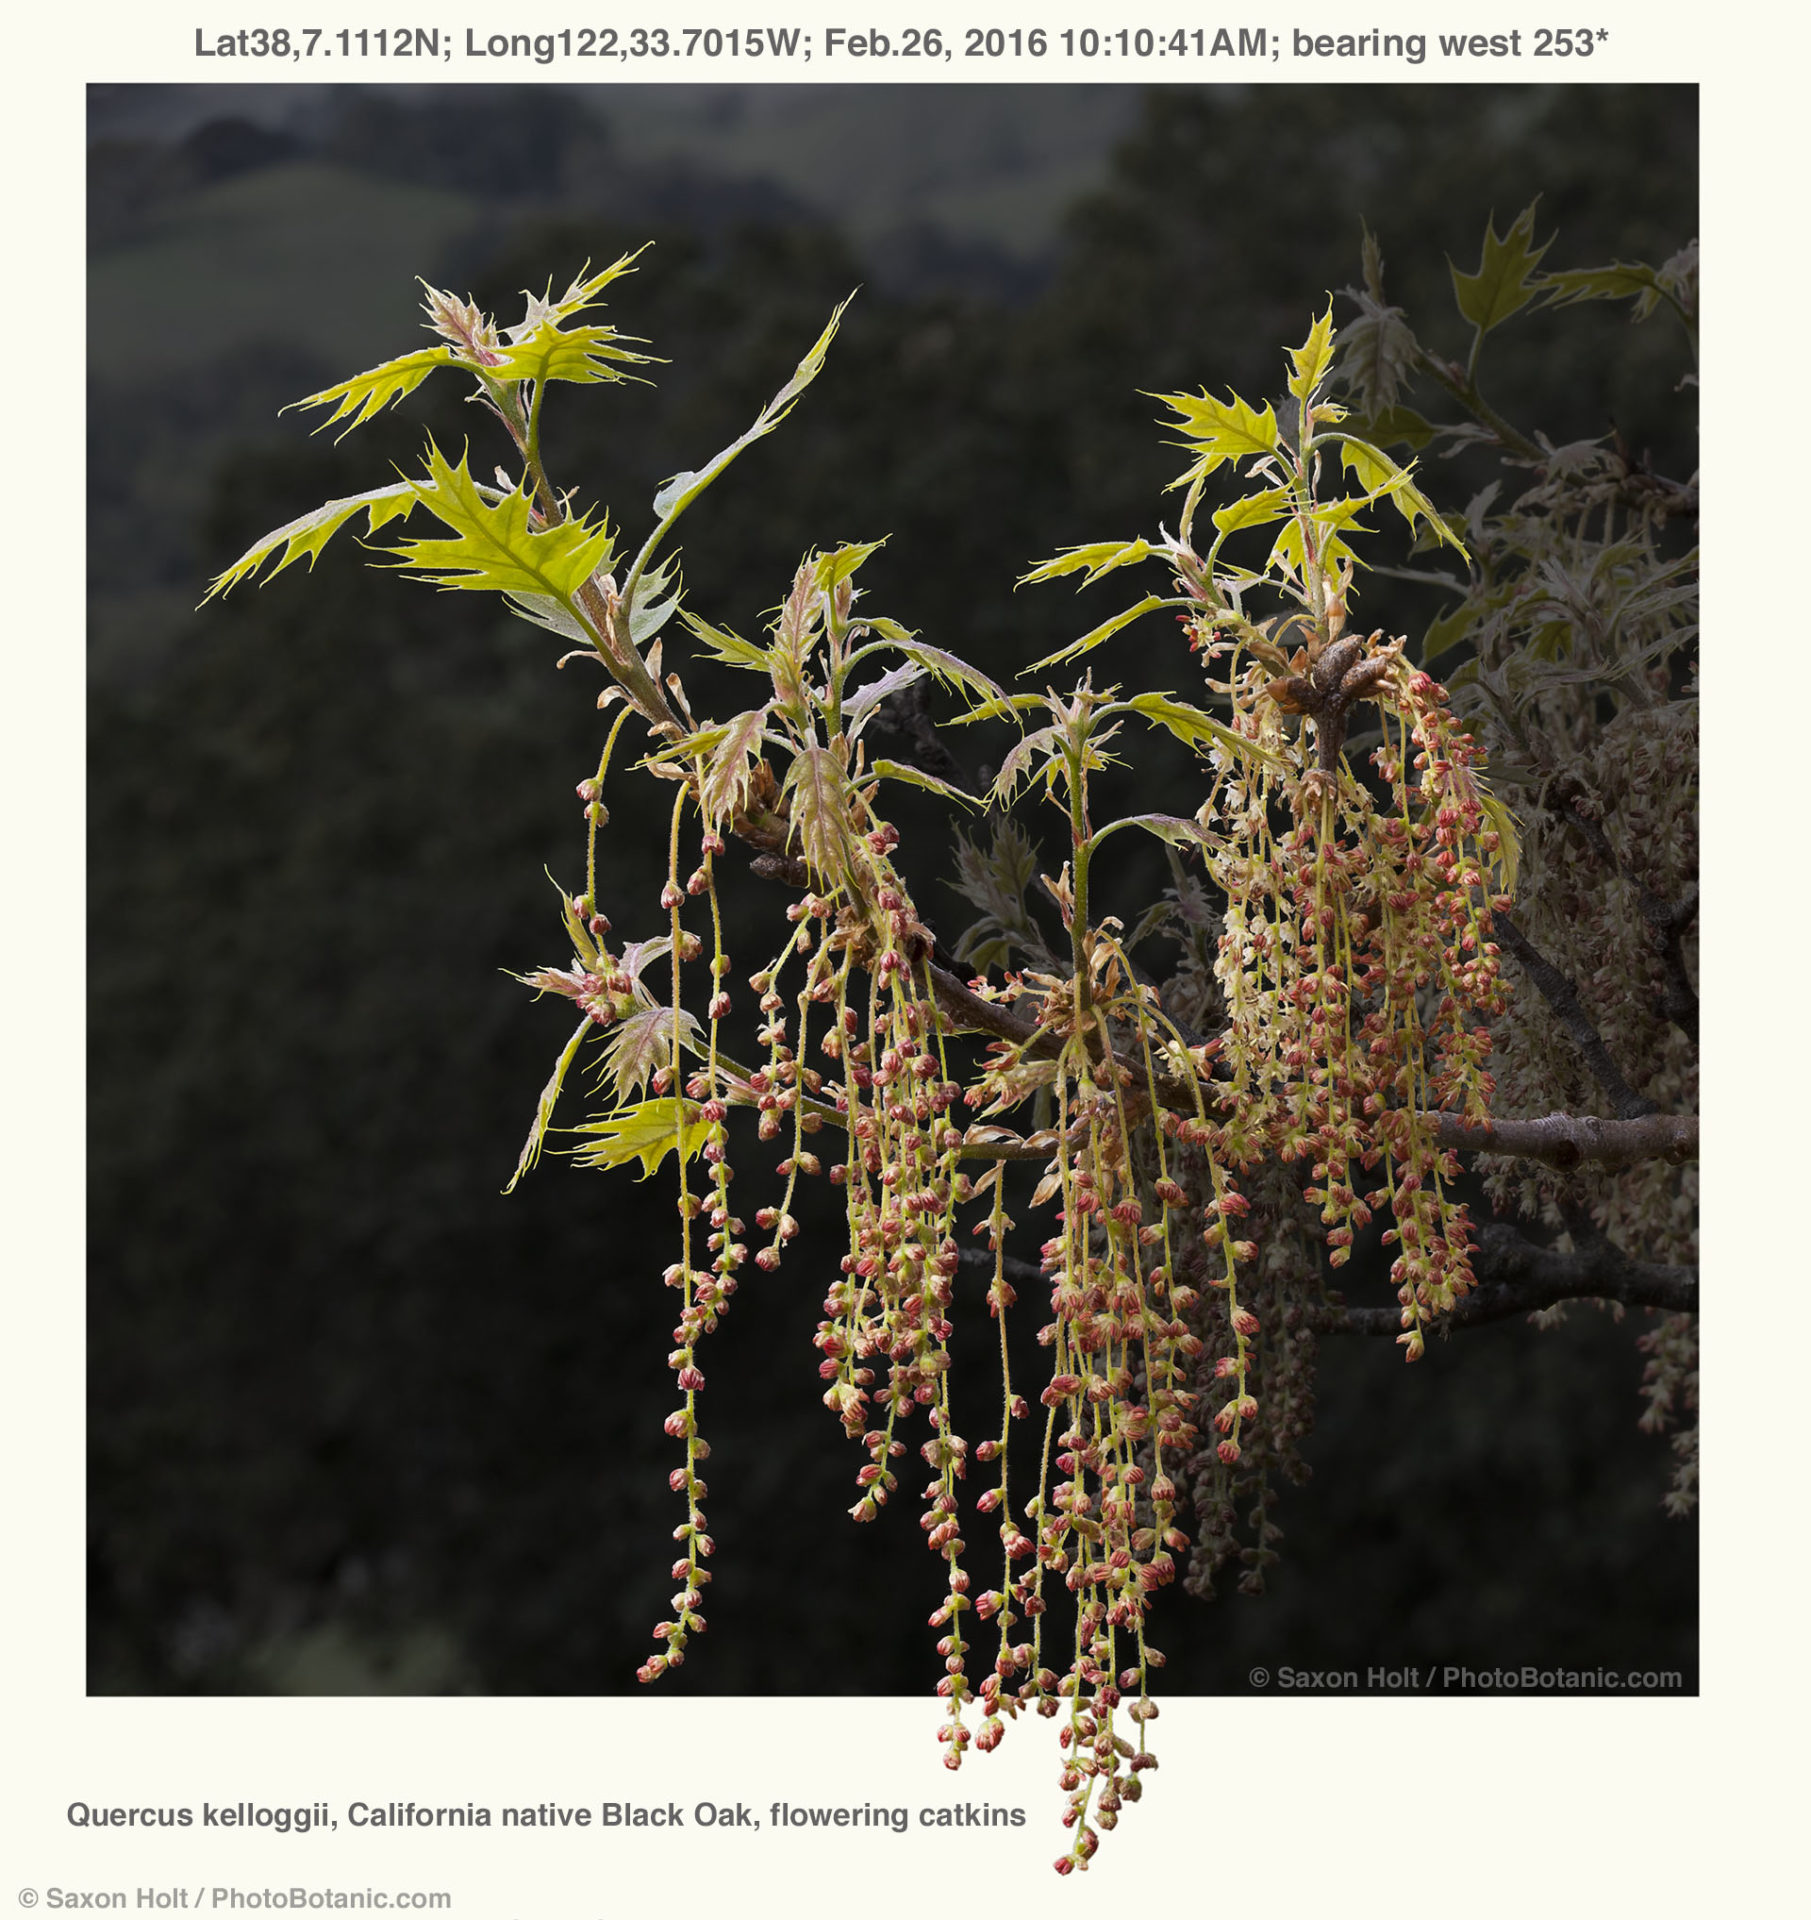 Quercus kelloggii, California native Black Oak, flowering catkins, Rush Creek Open Space; Lat38,7.1112N; Long122,33.7015W; Feb.26, 2016 10:10:41AM; bearing west 253*